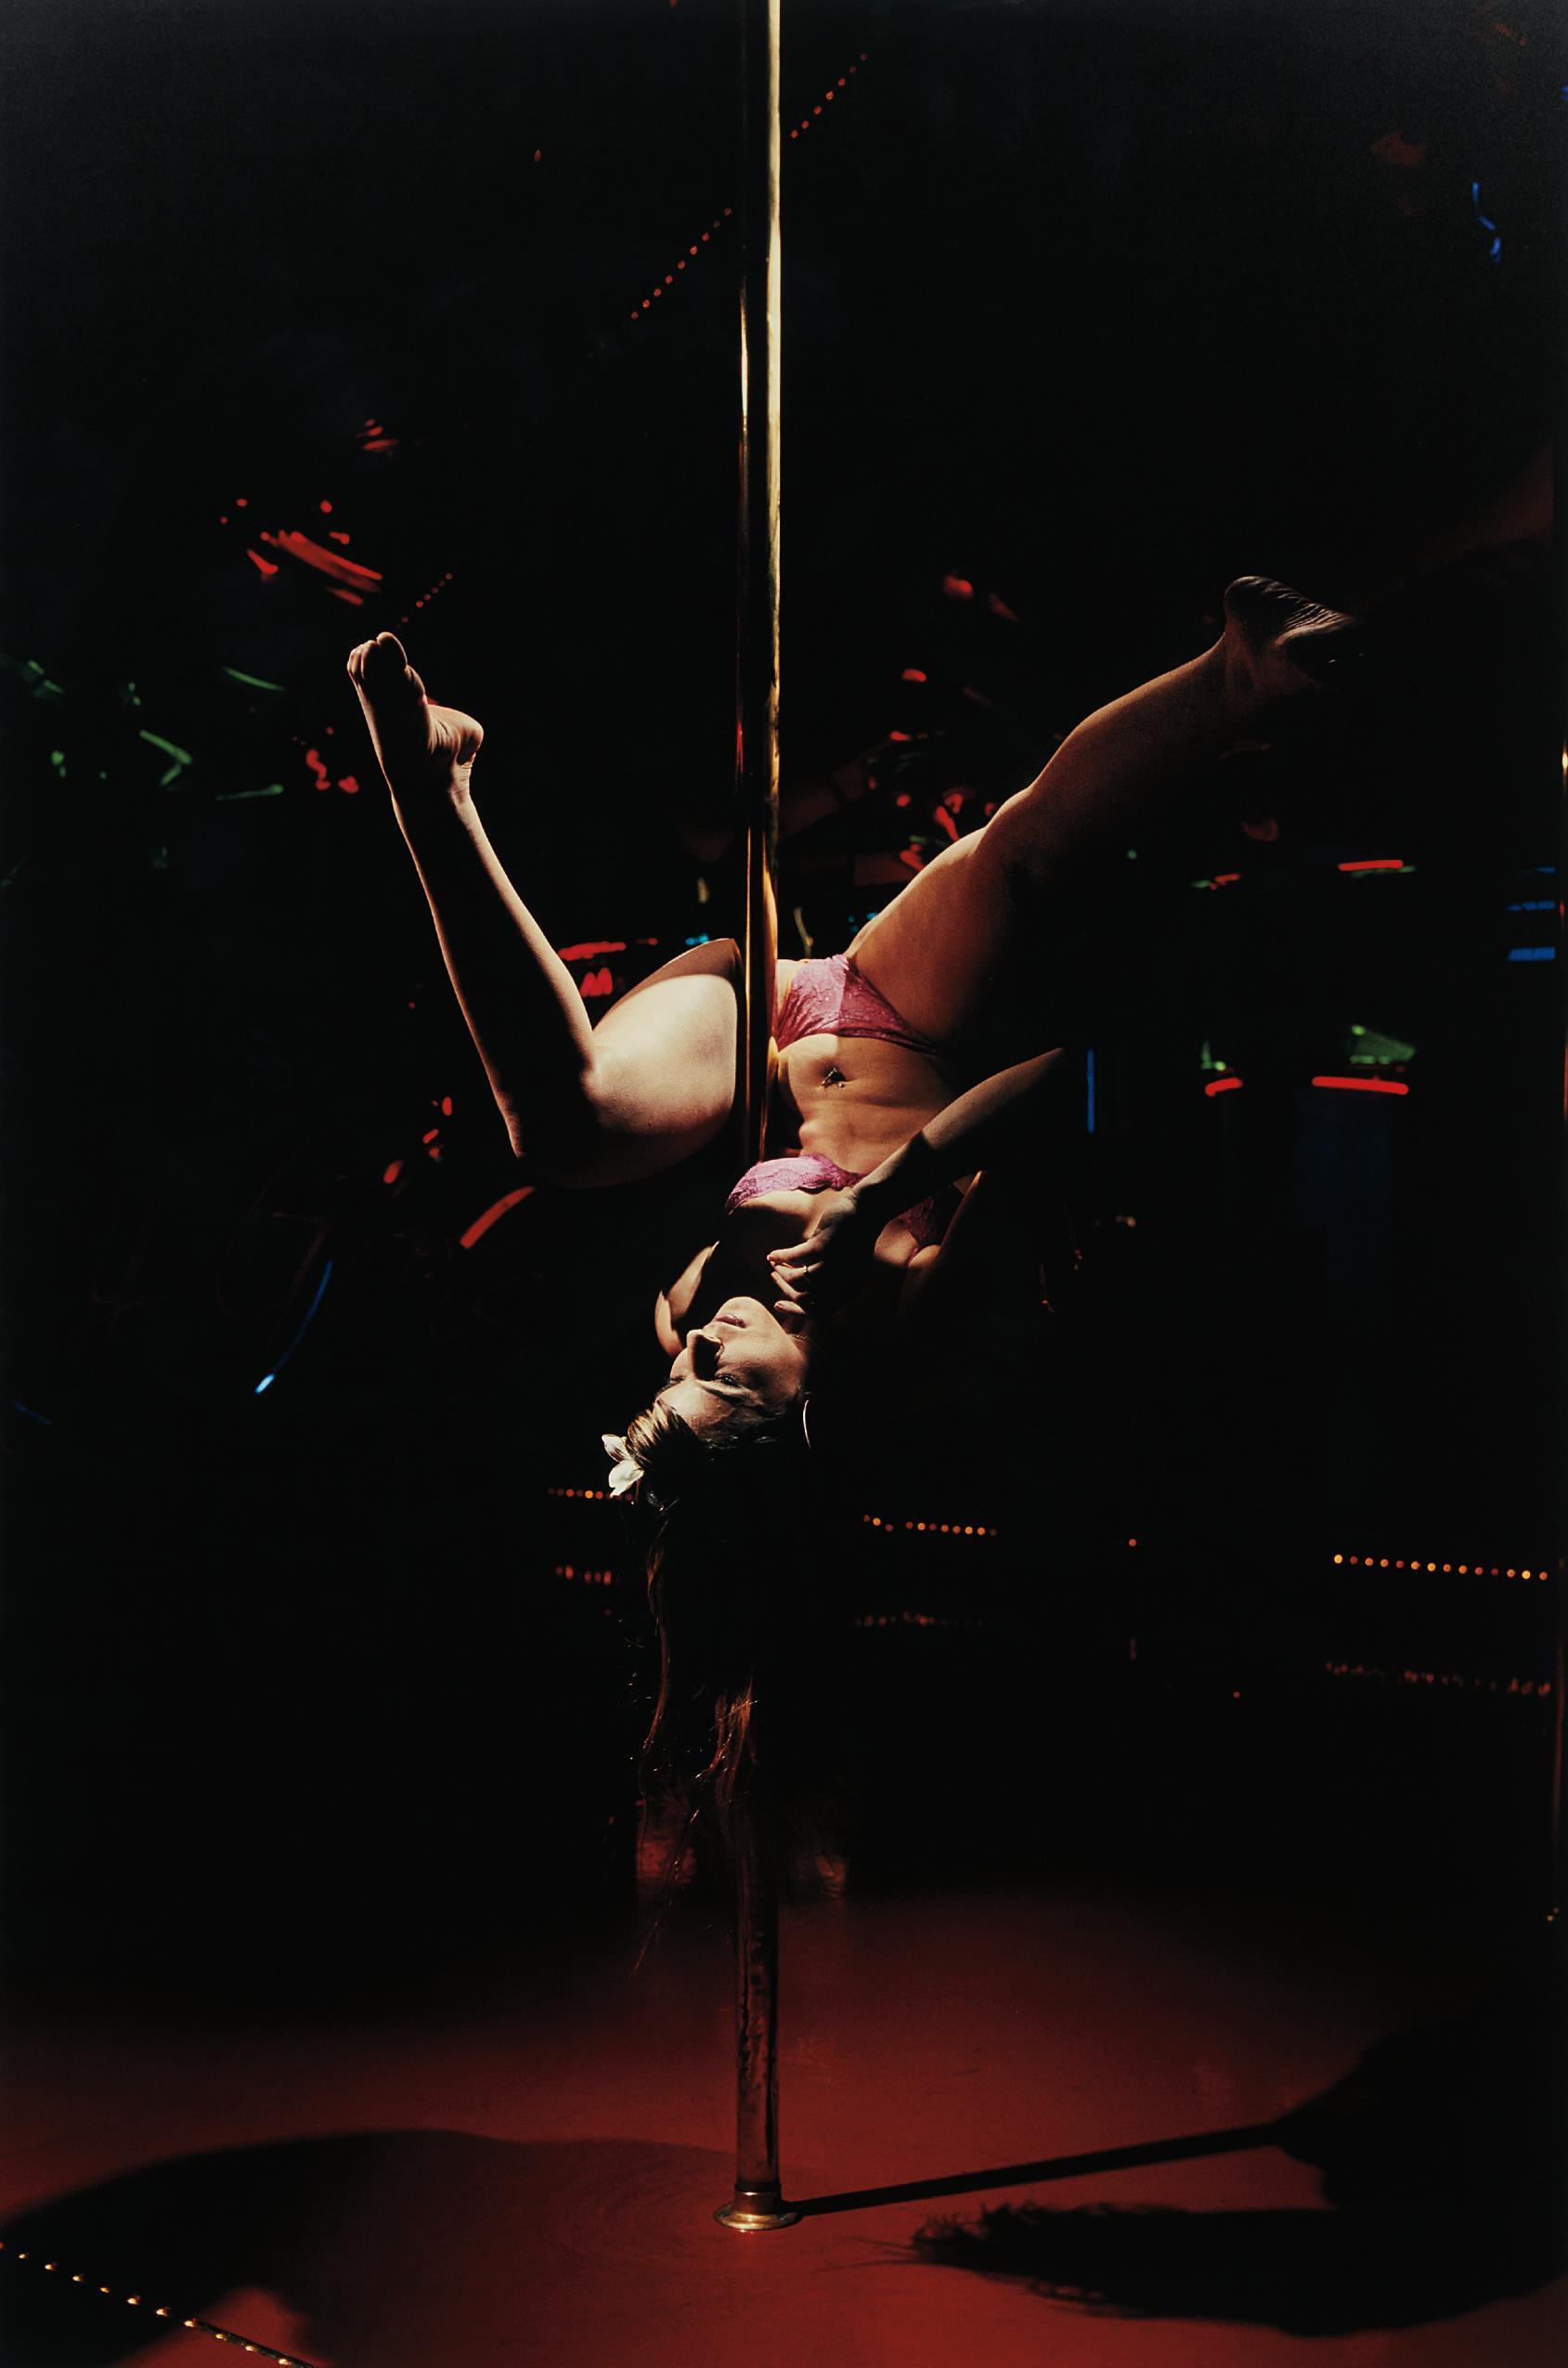 Philip-Lorca diCorcia-Heema-2004